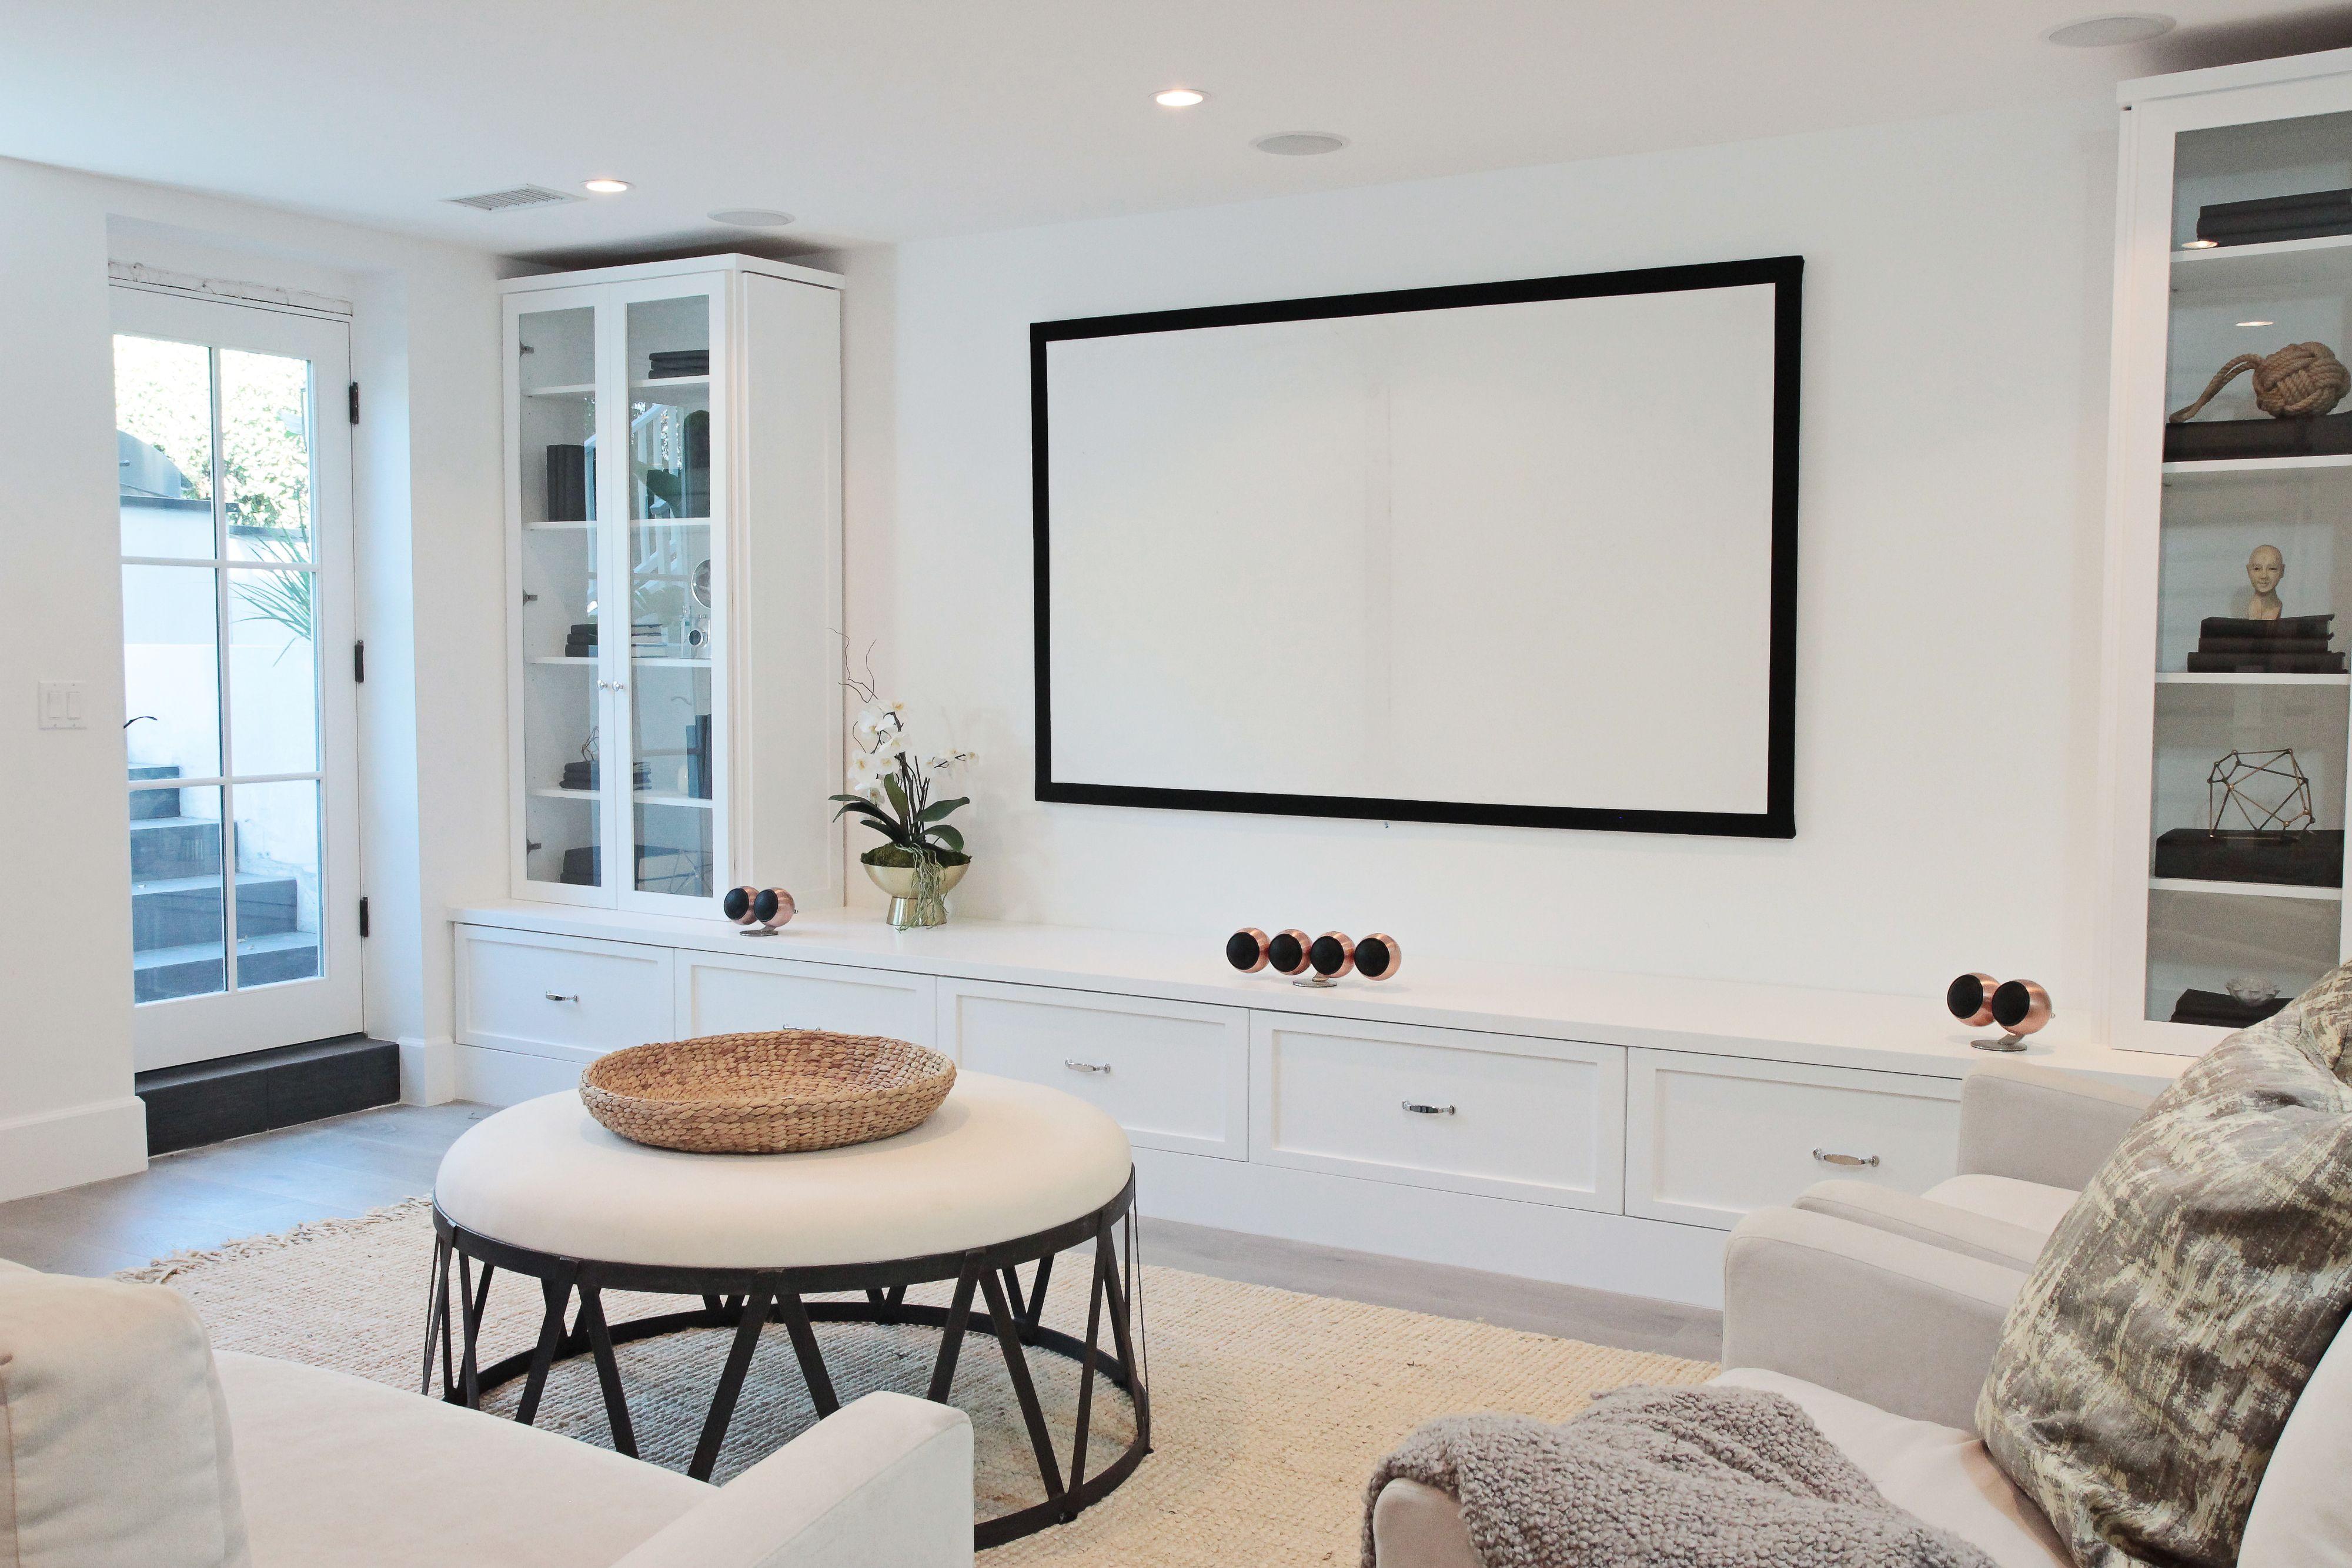 Living Room Surround Sound Systems Best Kitchen Gallery ...